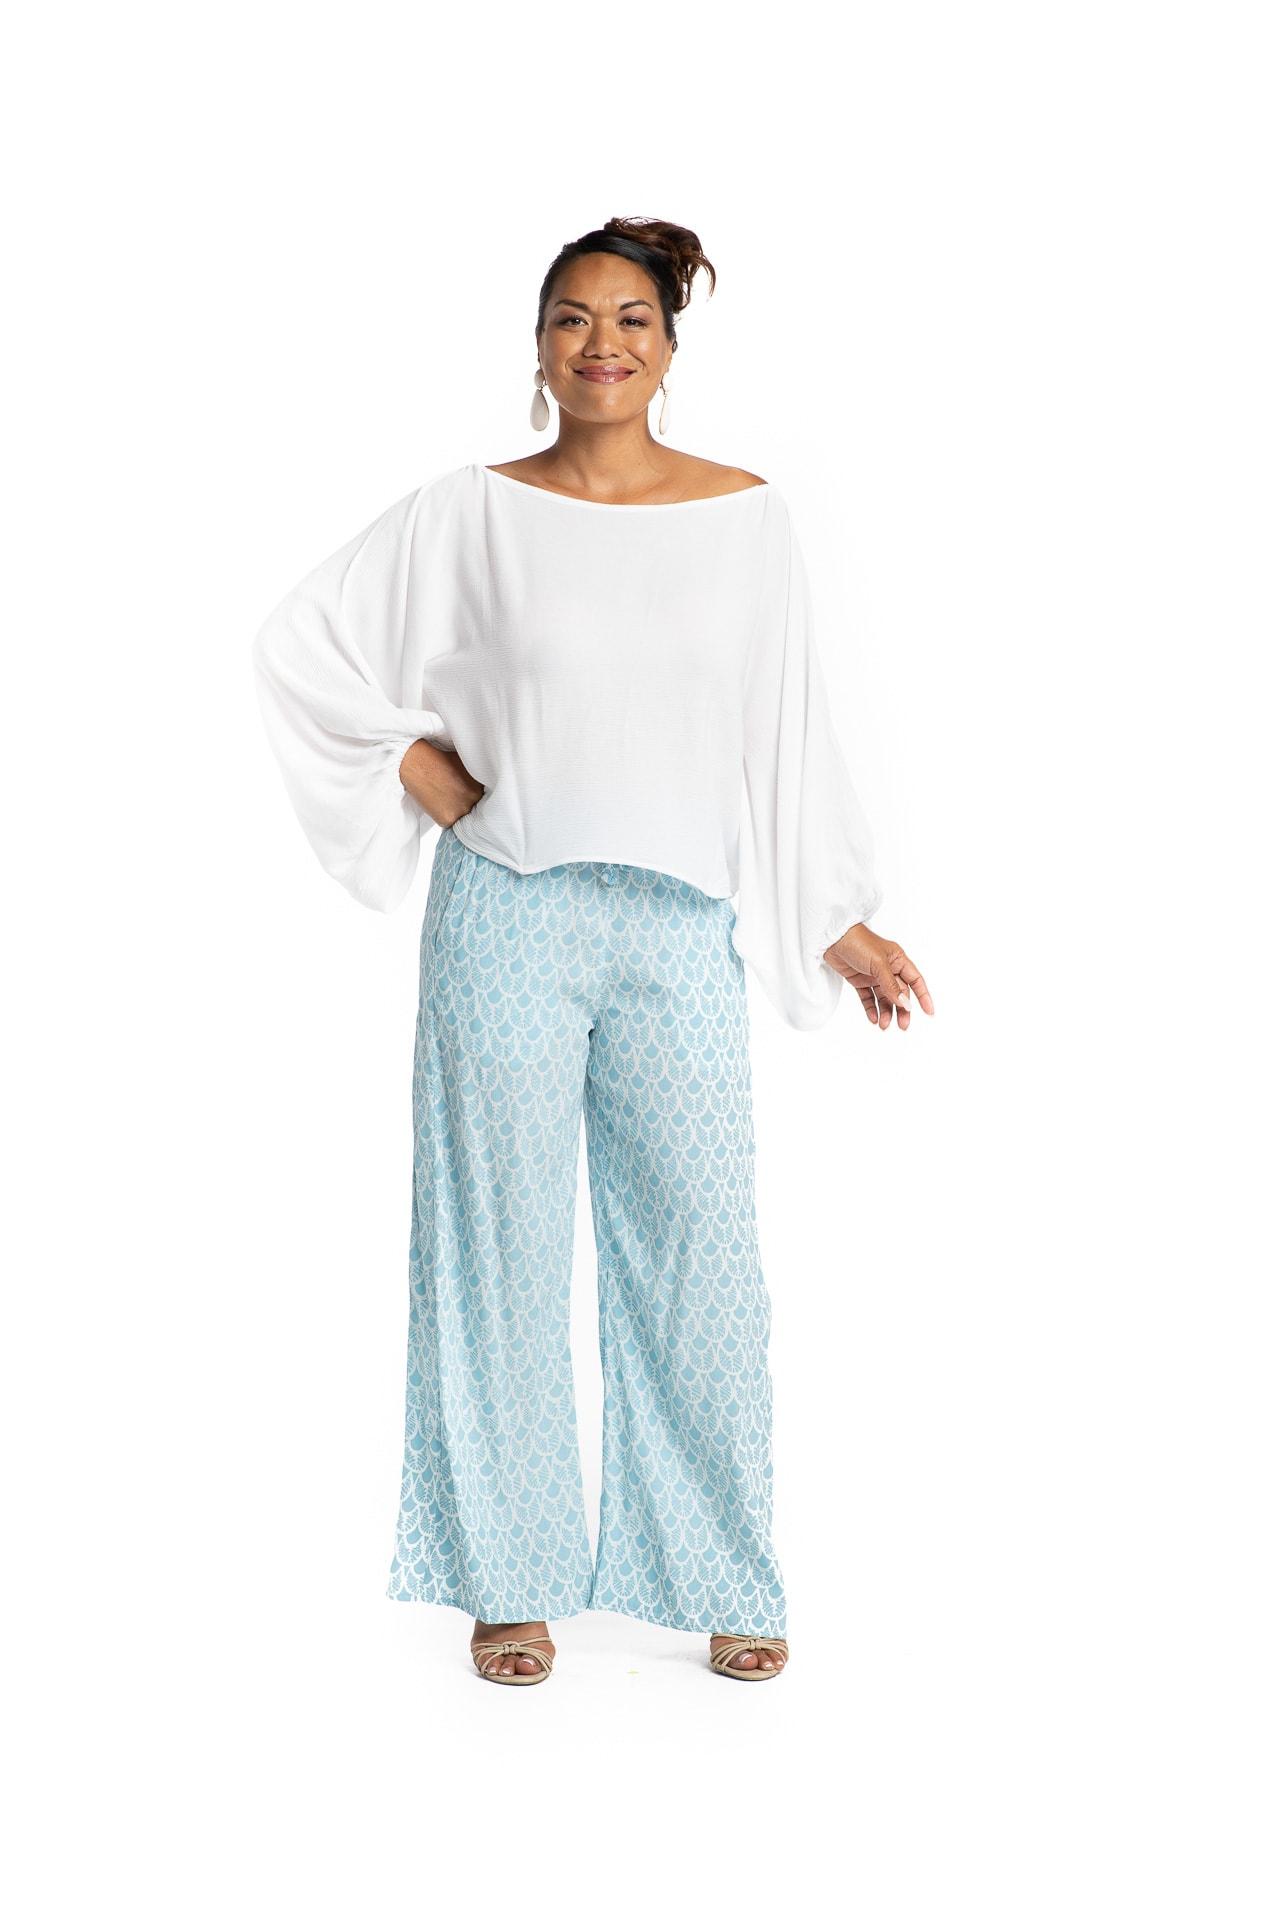 Model wearing Ola Pants